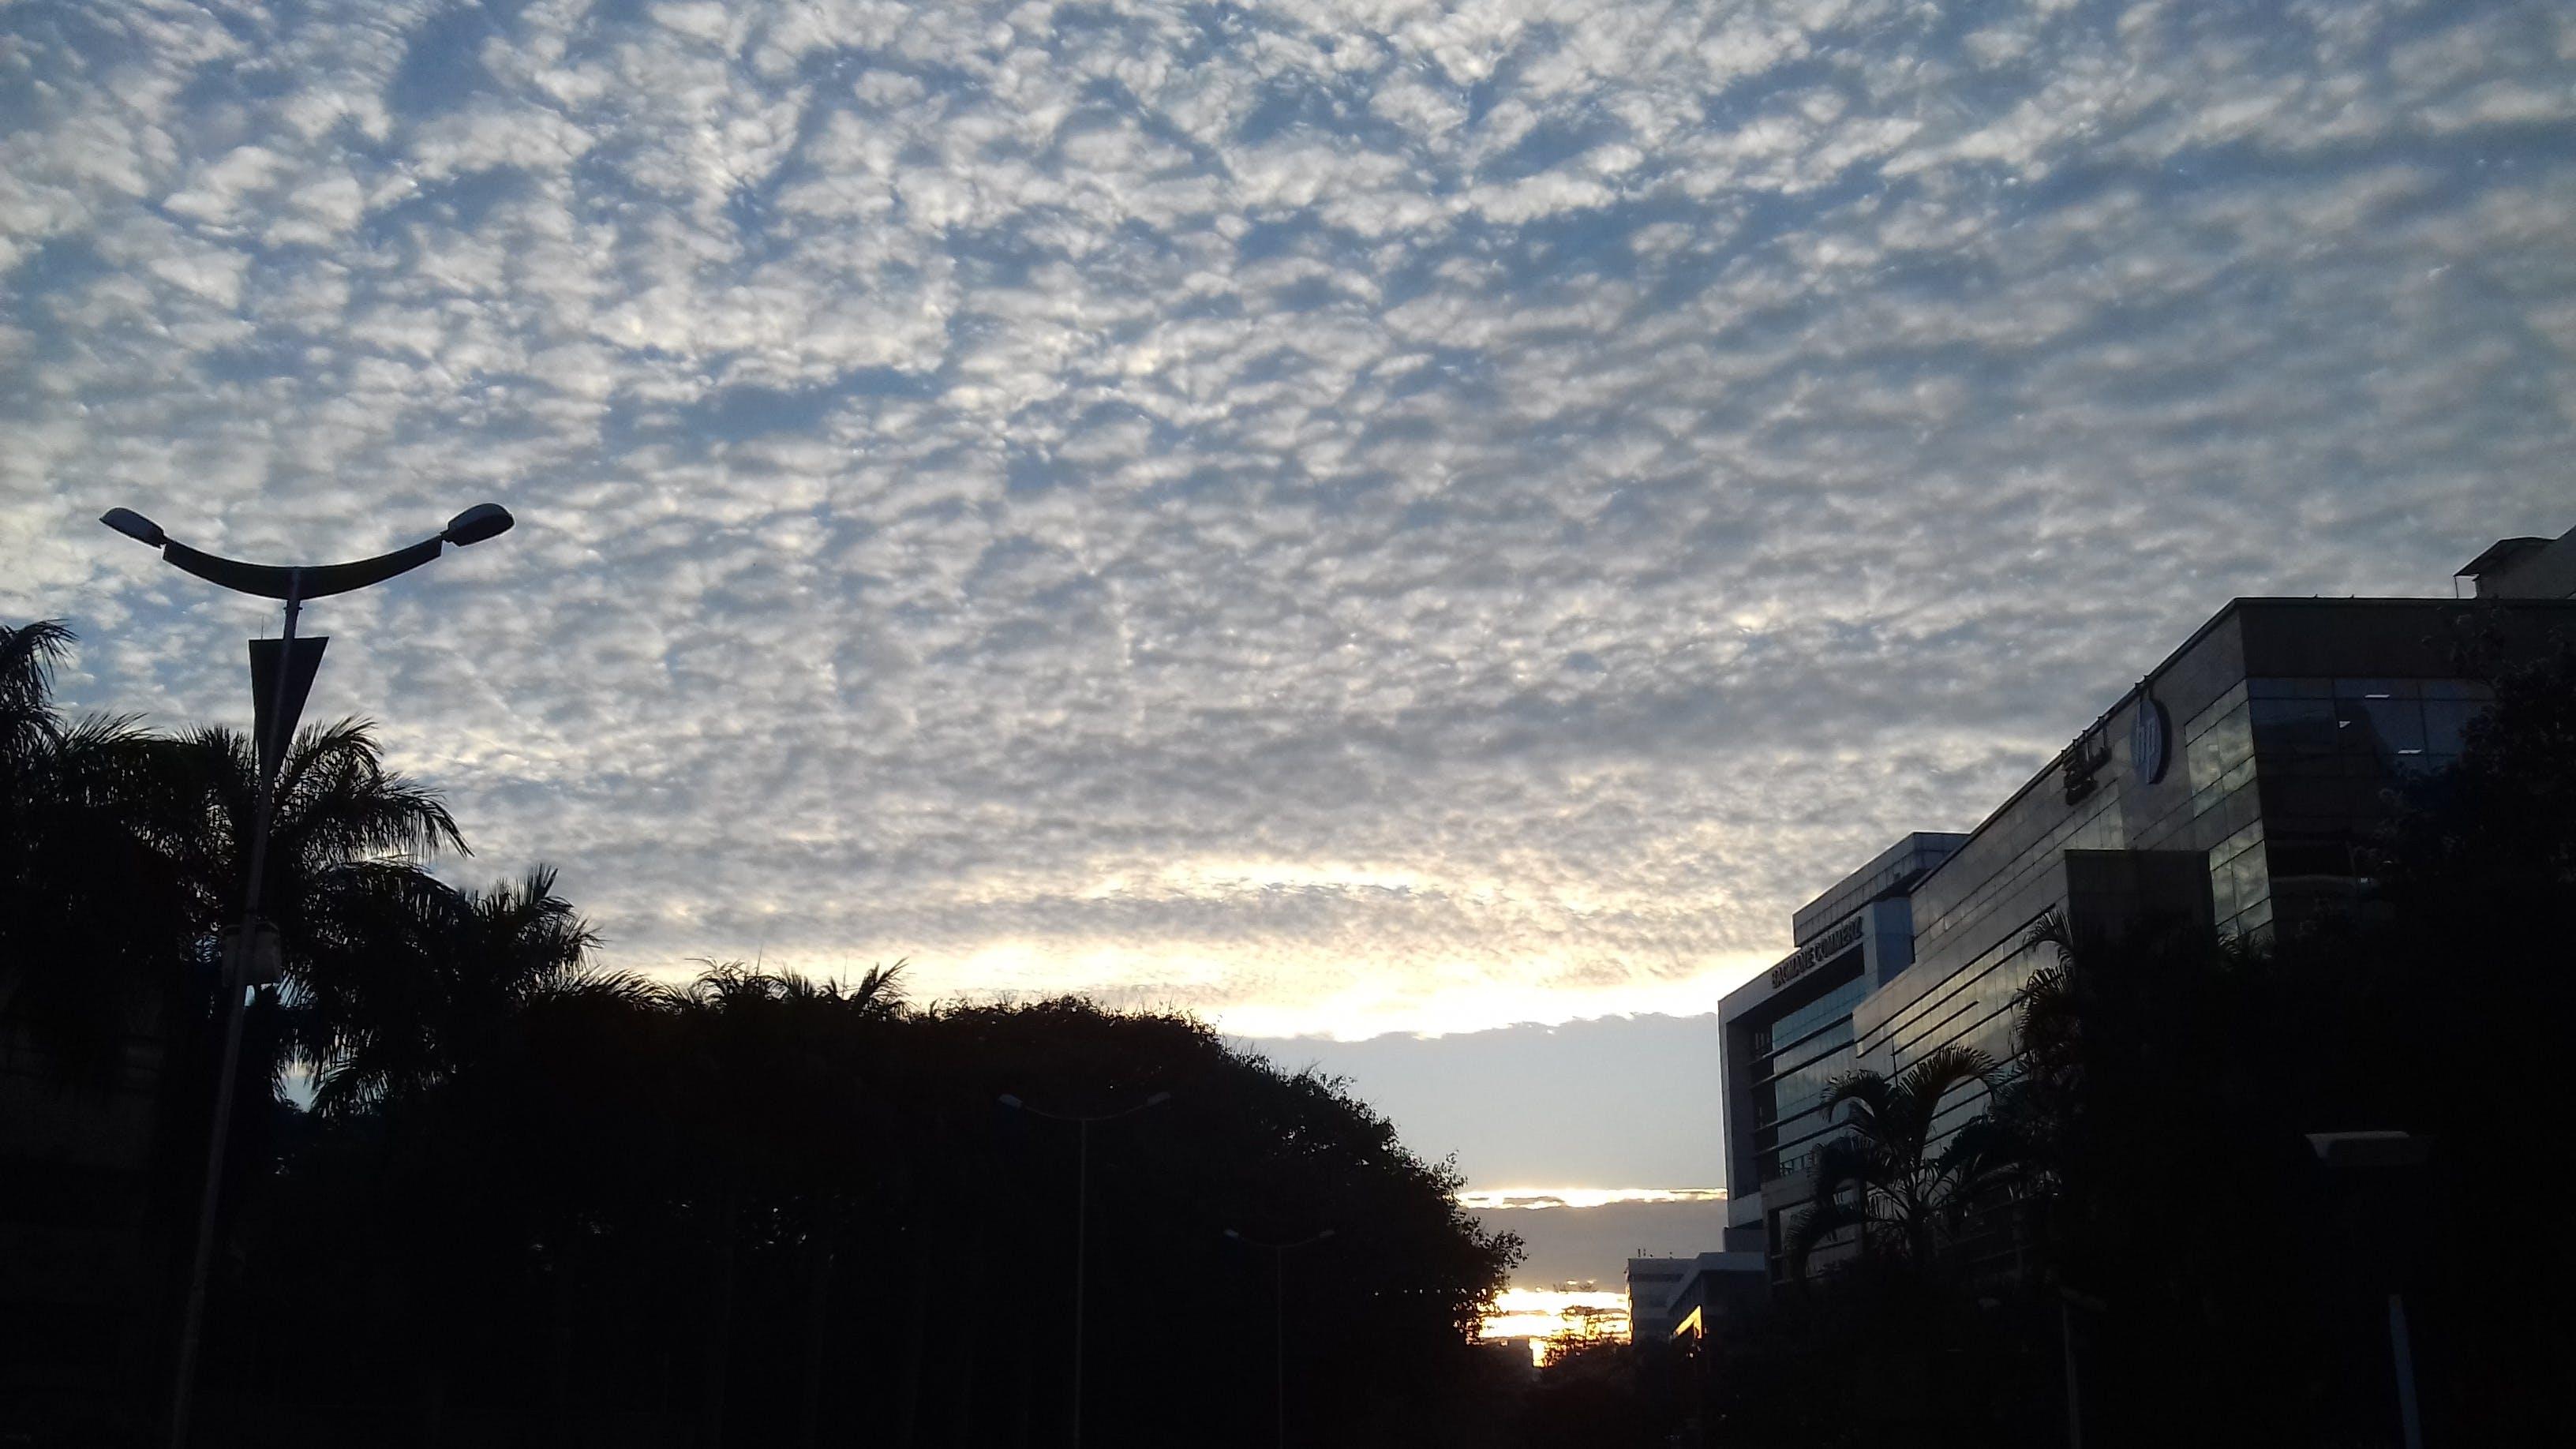 Free stock photo of Good Morning, sky blue